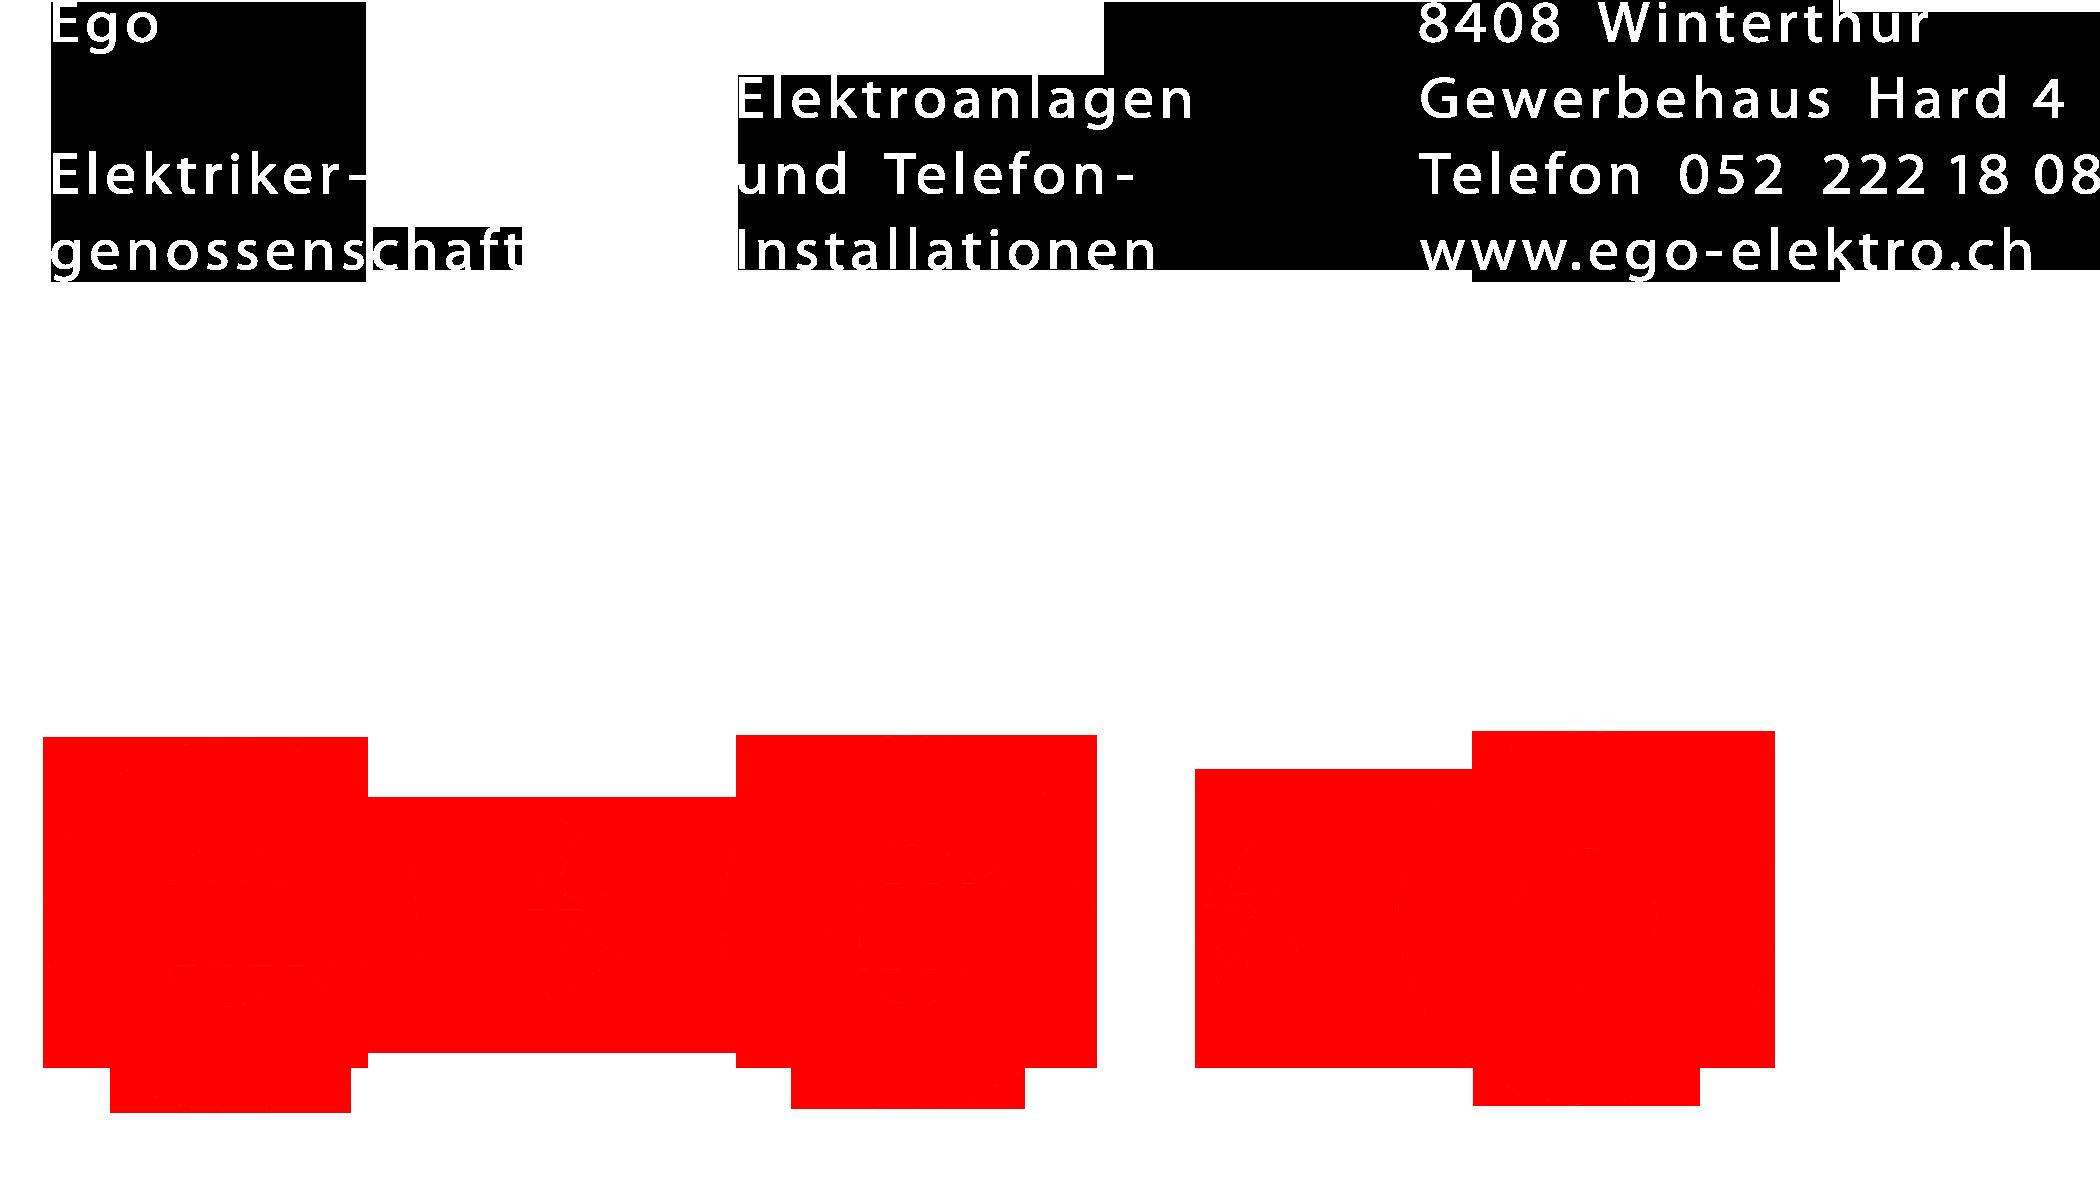 Elektriker Genossenschaft Elektroinstallateur Winterthur - Elektro - EGO